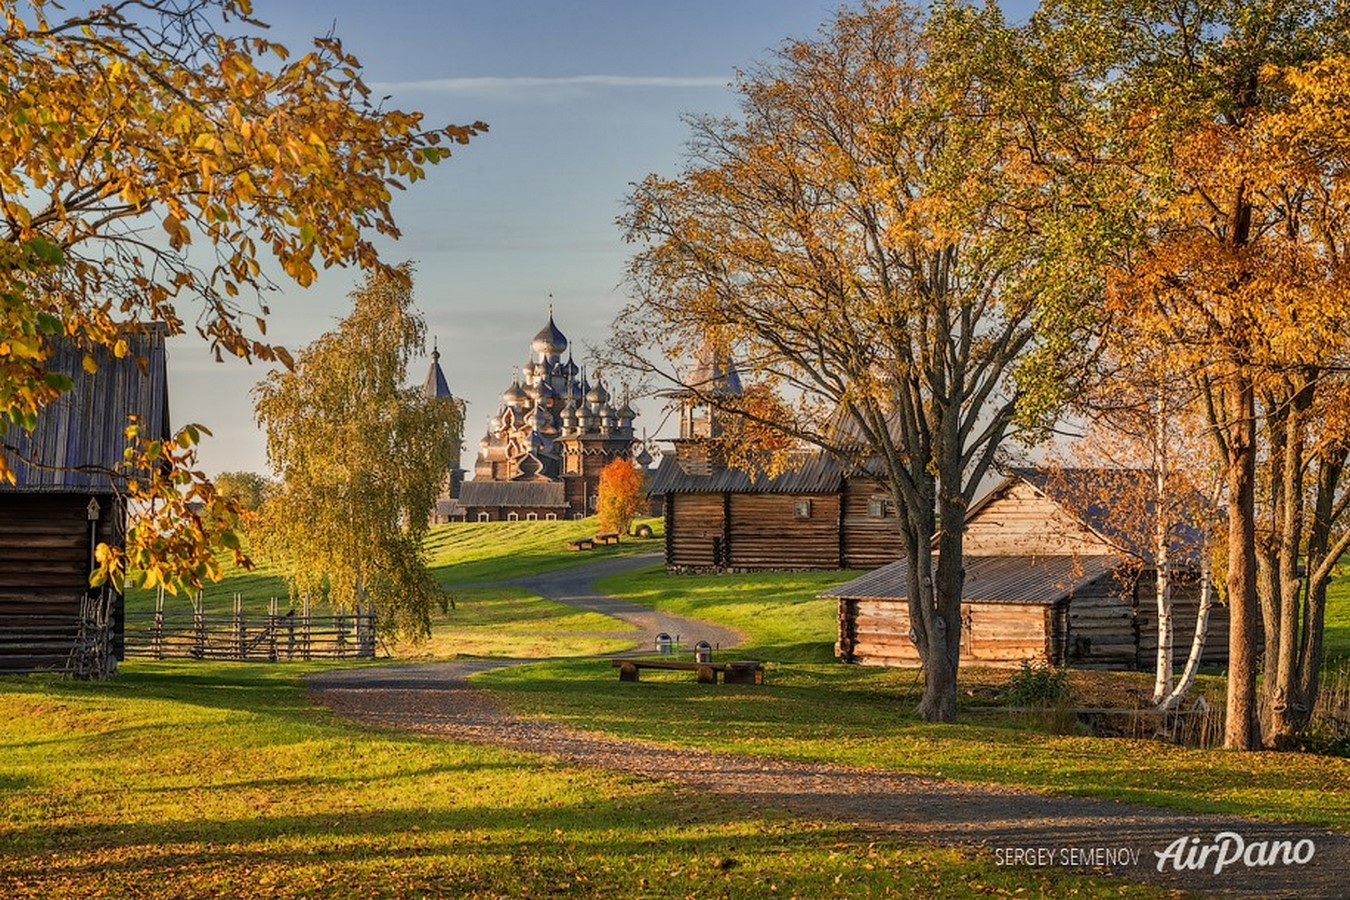 Wooden Architecture of Kizhi Island, Russia - Sheet2